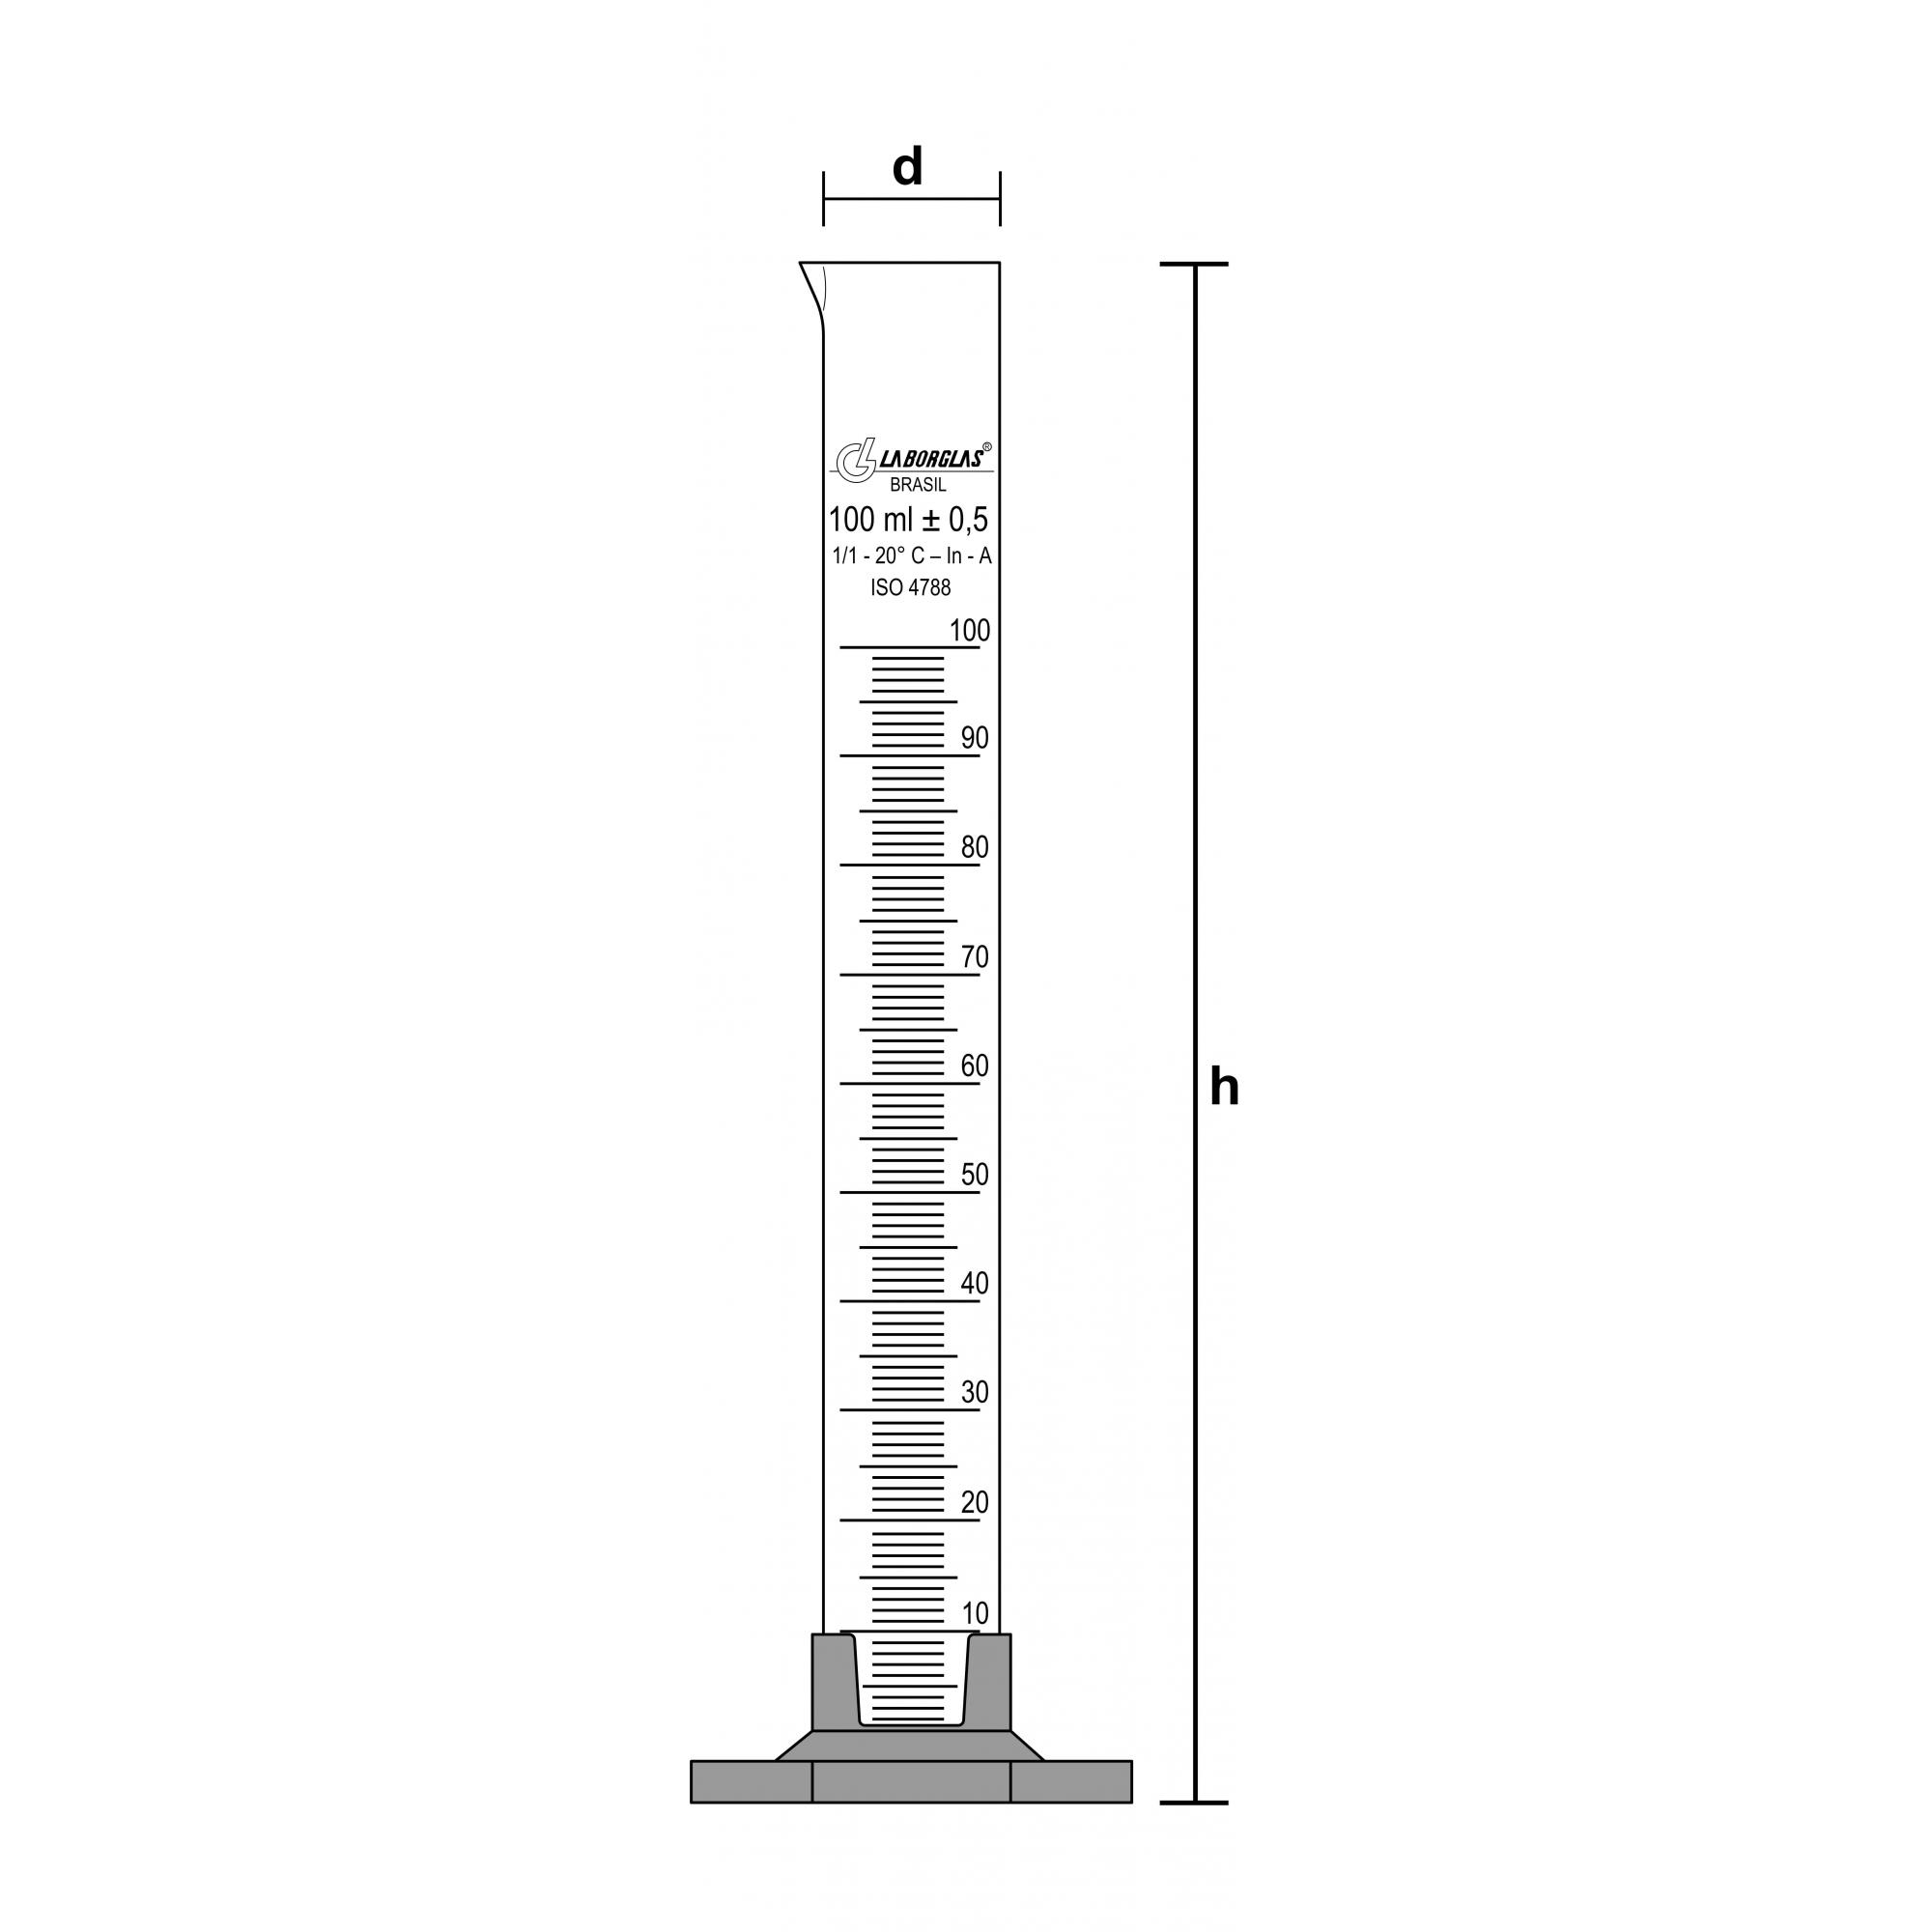 PROVETA GRADUADA BASE HEXAGONAL DE POLIPROPILENO 250 ML CLASSE A CERTIFICADO RASTREÁVEL - Laborglas - Cód. 9138736-C